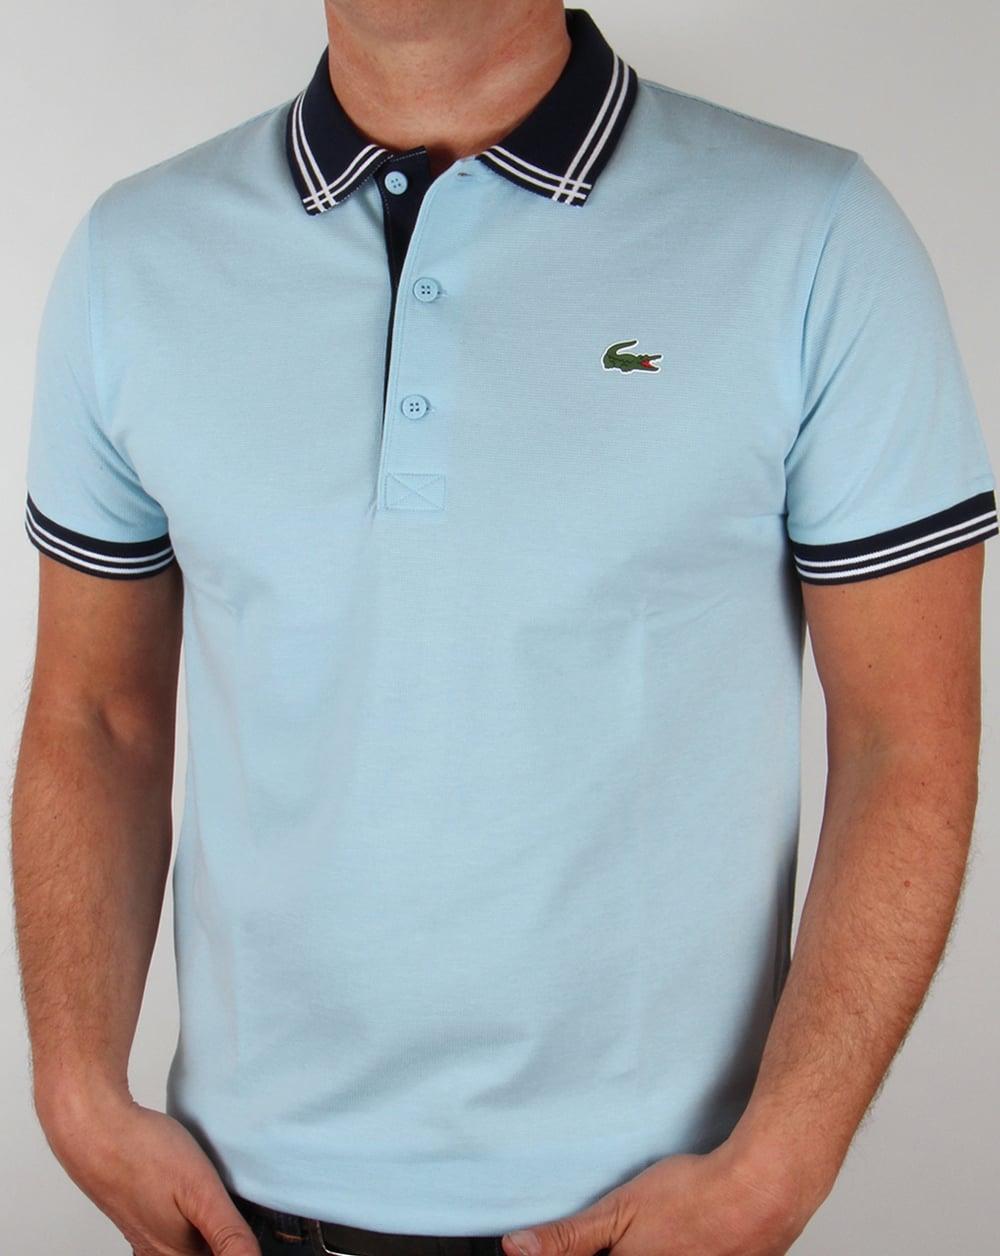 Lacoste Piping Collar Golf Polo Shirt Sky Bluenavymens